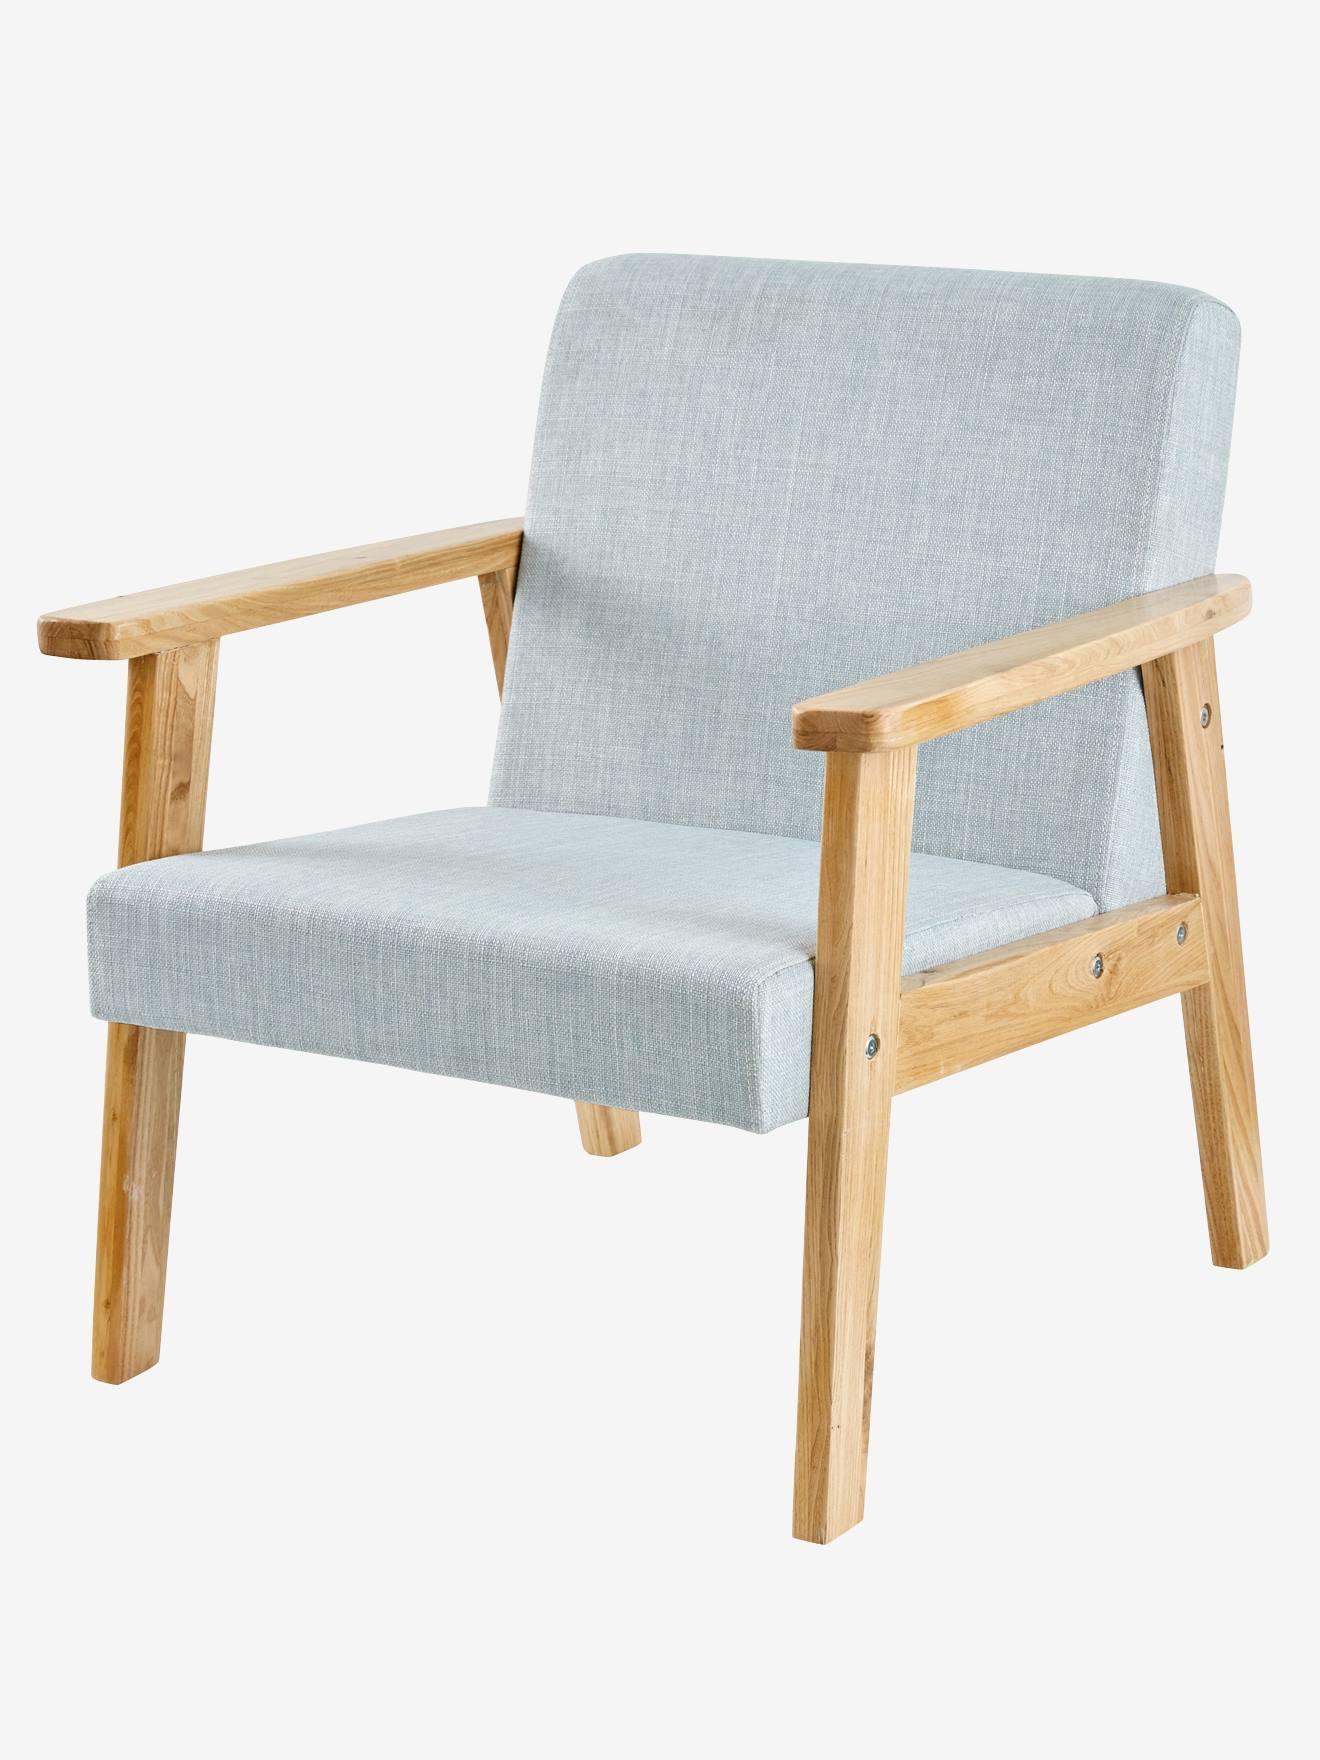 Full Size of Sessel Kinderzimmer Vertbaudet Holz Fr Relaxsessel Garten Regale Lounge Regal Hängesessel Schlafzimmer Sofa Aldi Weiß Wohnzimmer Kinderzimmer Sessel Kinderzimmer